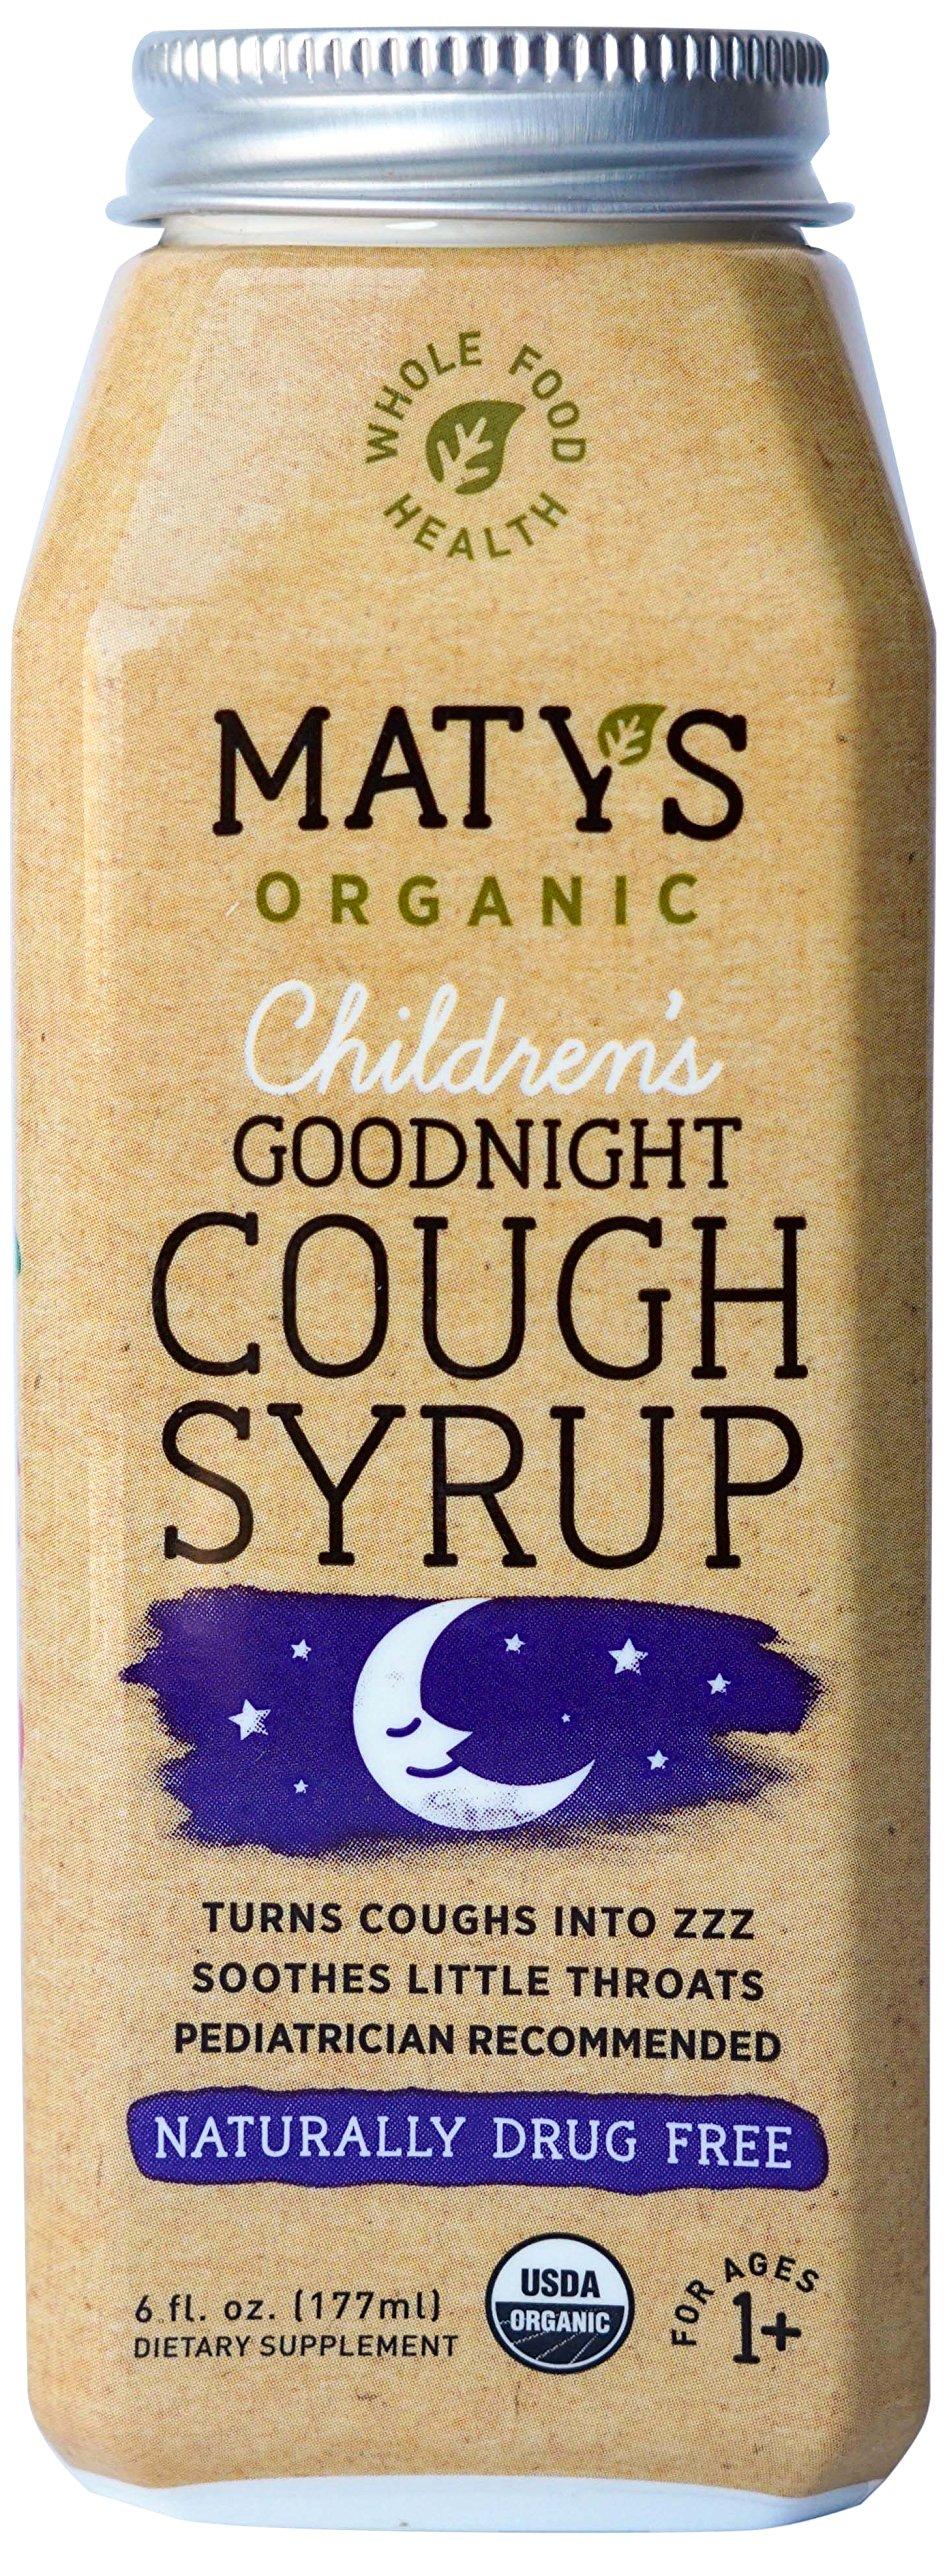 Matys Organic Children's Goodnight Cough Syrup, 6 Fluid Ounce